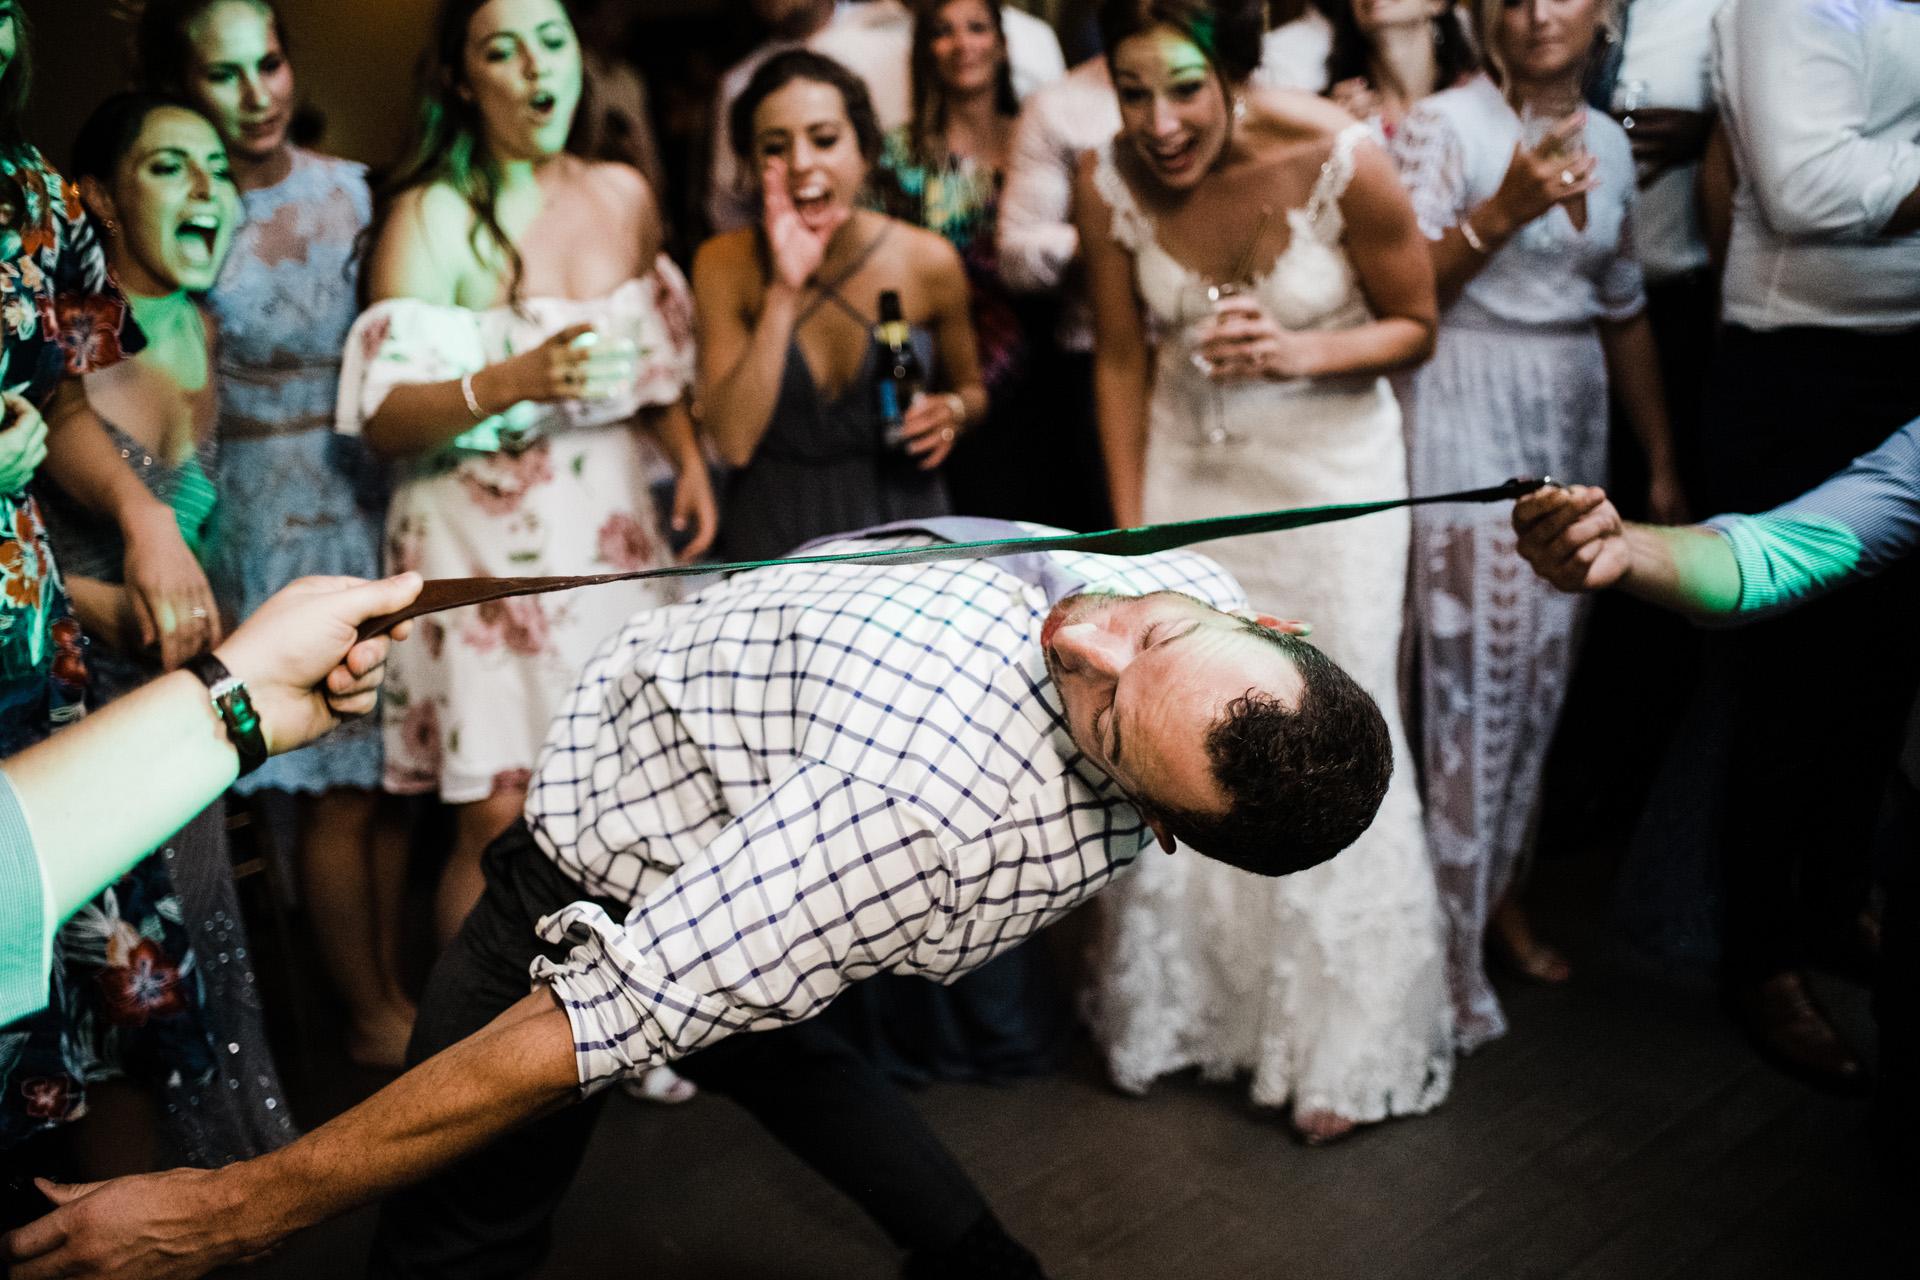 rivermill-new-hampshire-wedding-65